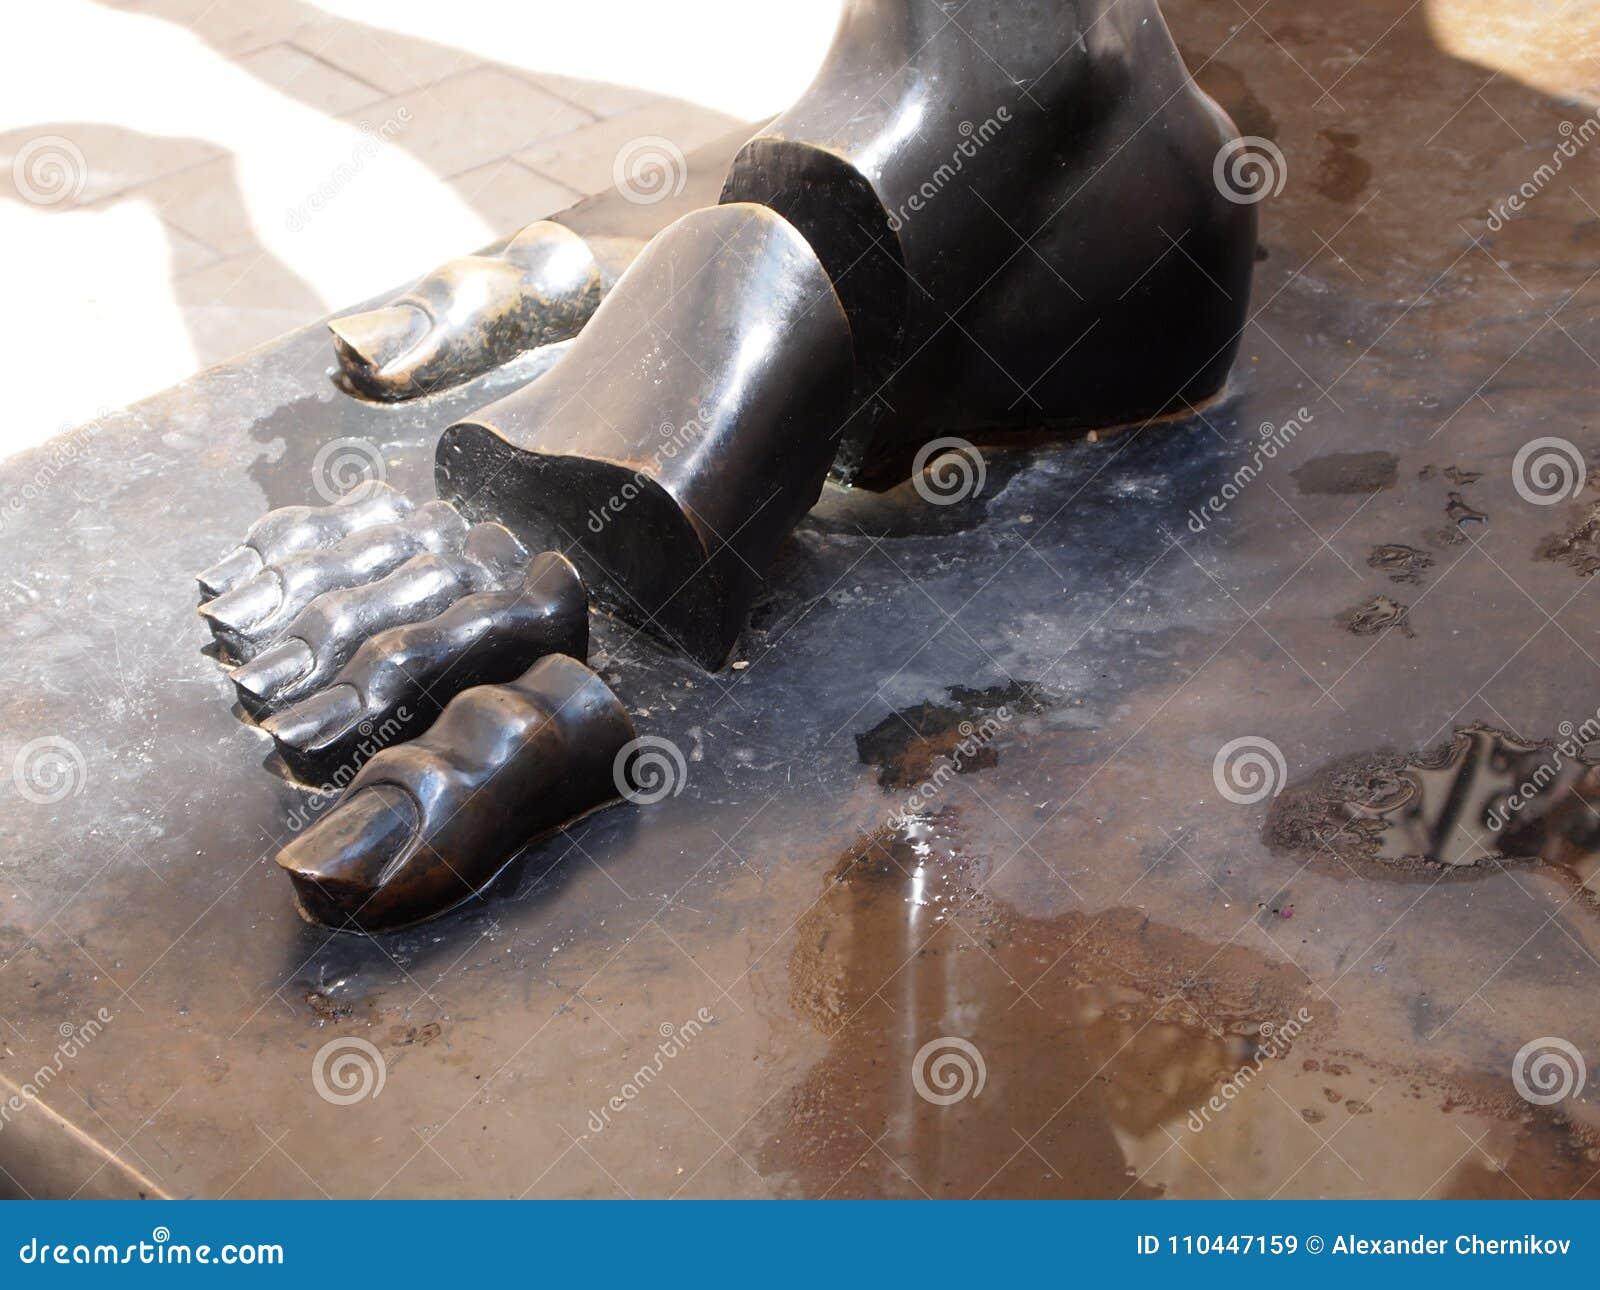 Fragment of sculpture Salvador Dali, dissected bronze foot . Figueres, Spain June 2011.